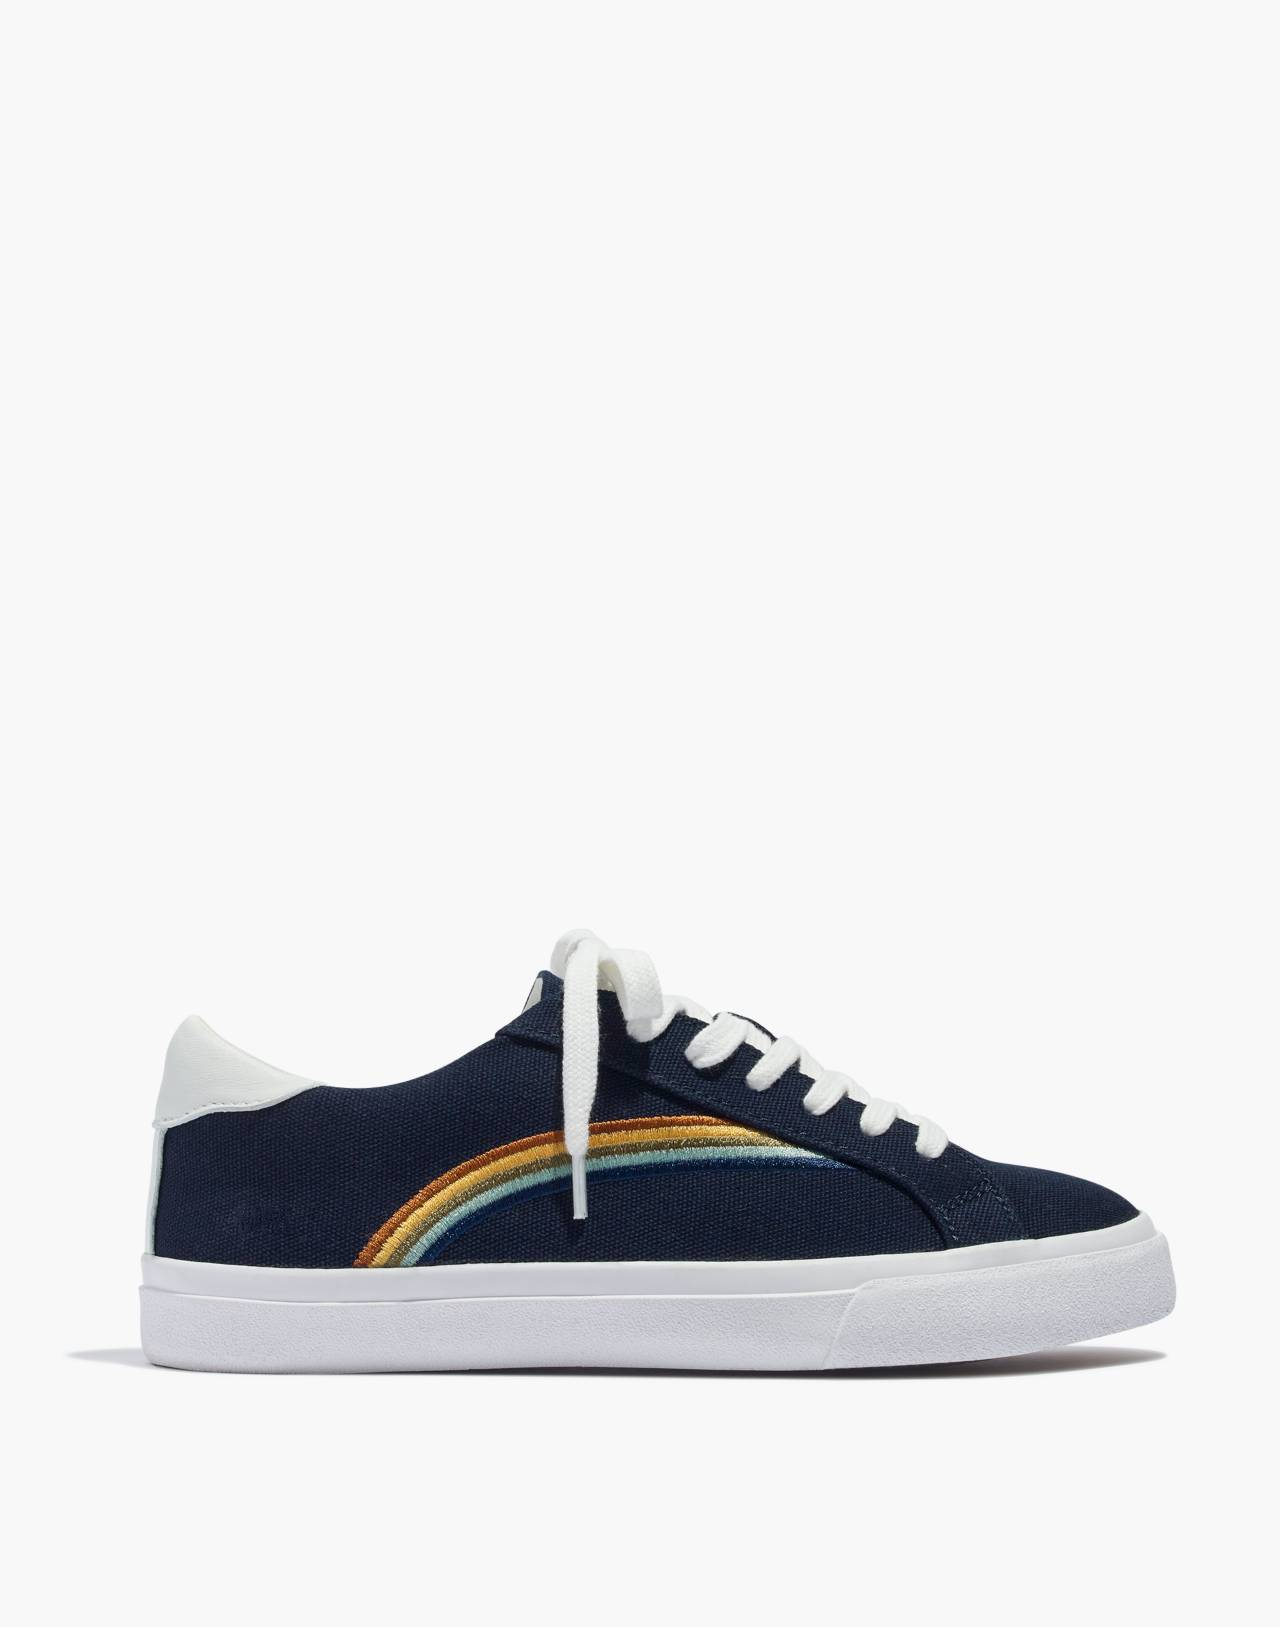 Women's Sidewalk Low-Top Sneakers in Rainbow Embroidered Canvas in deep navy image 3